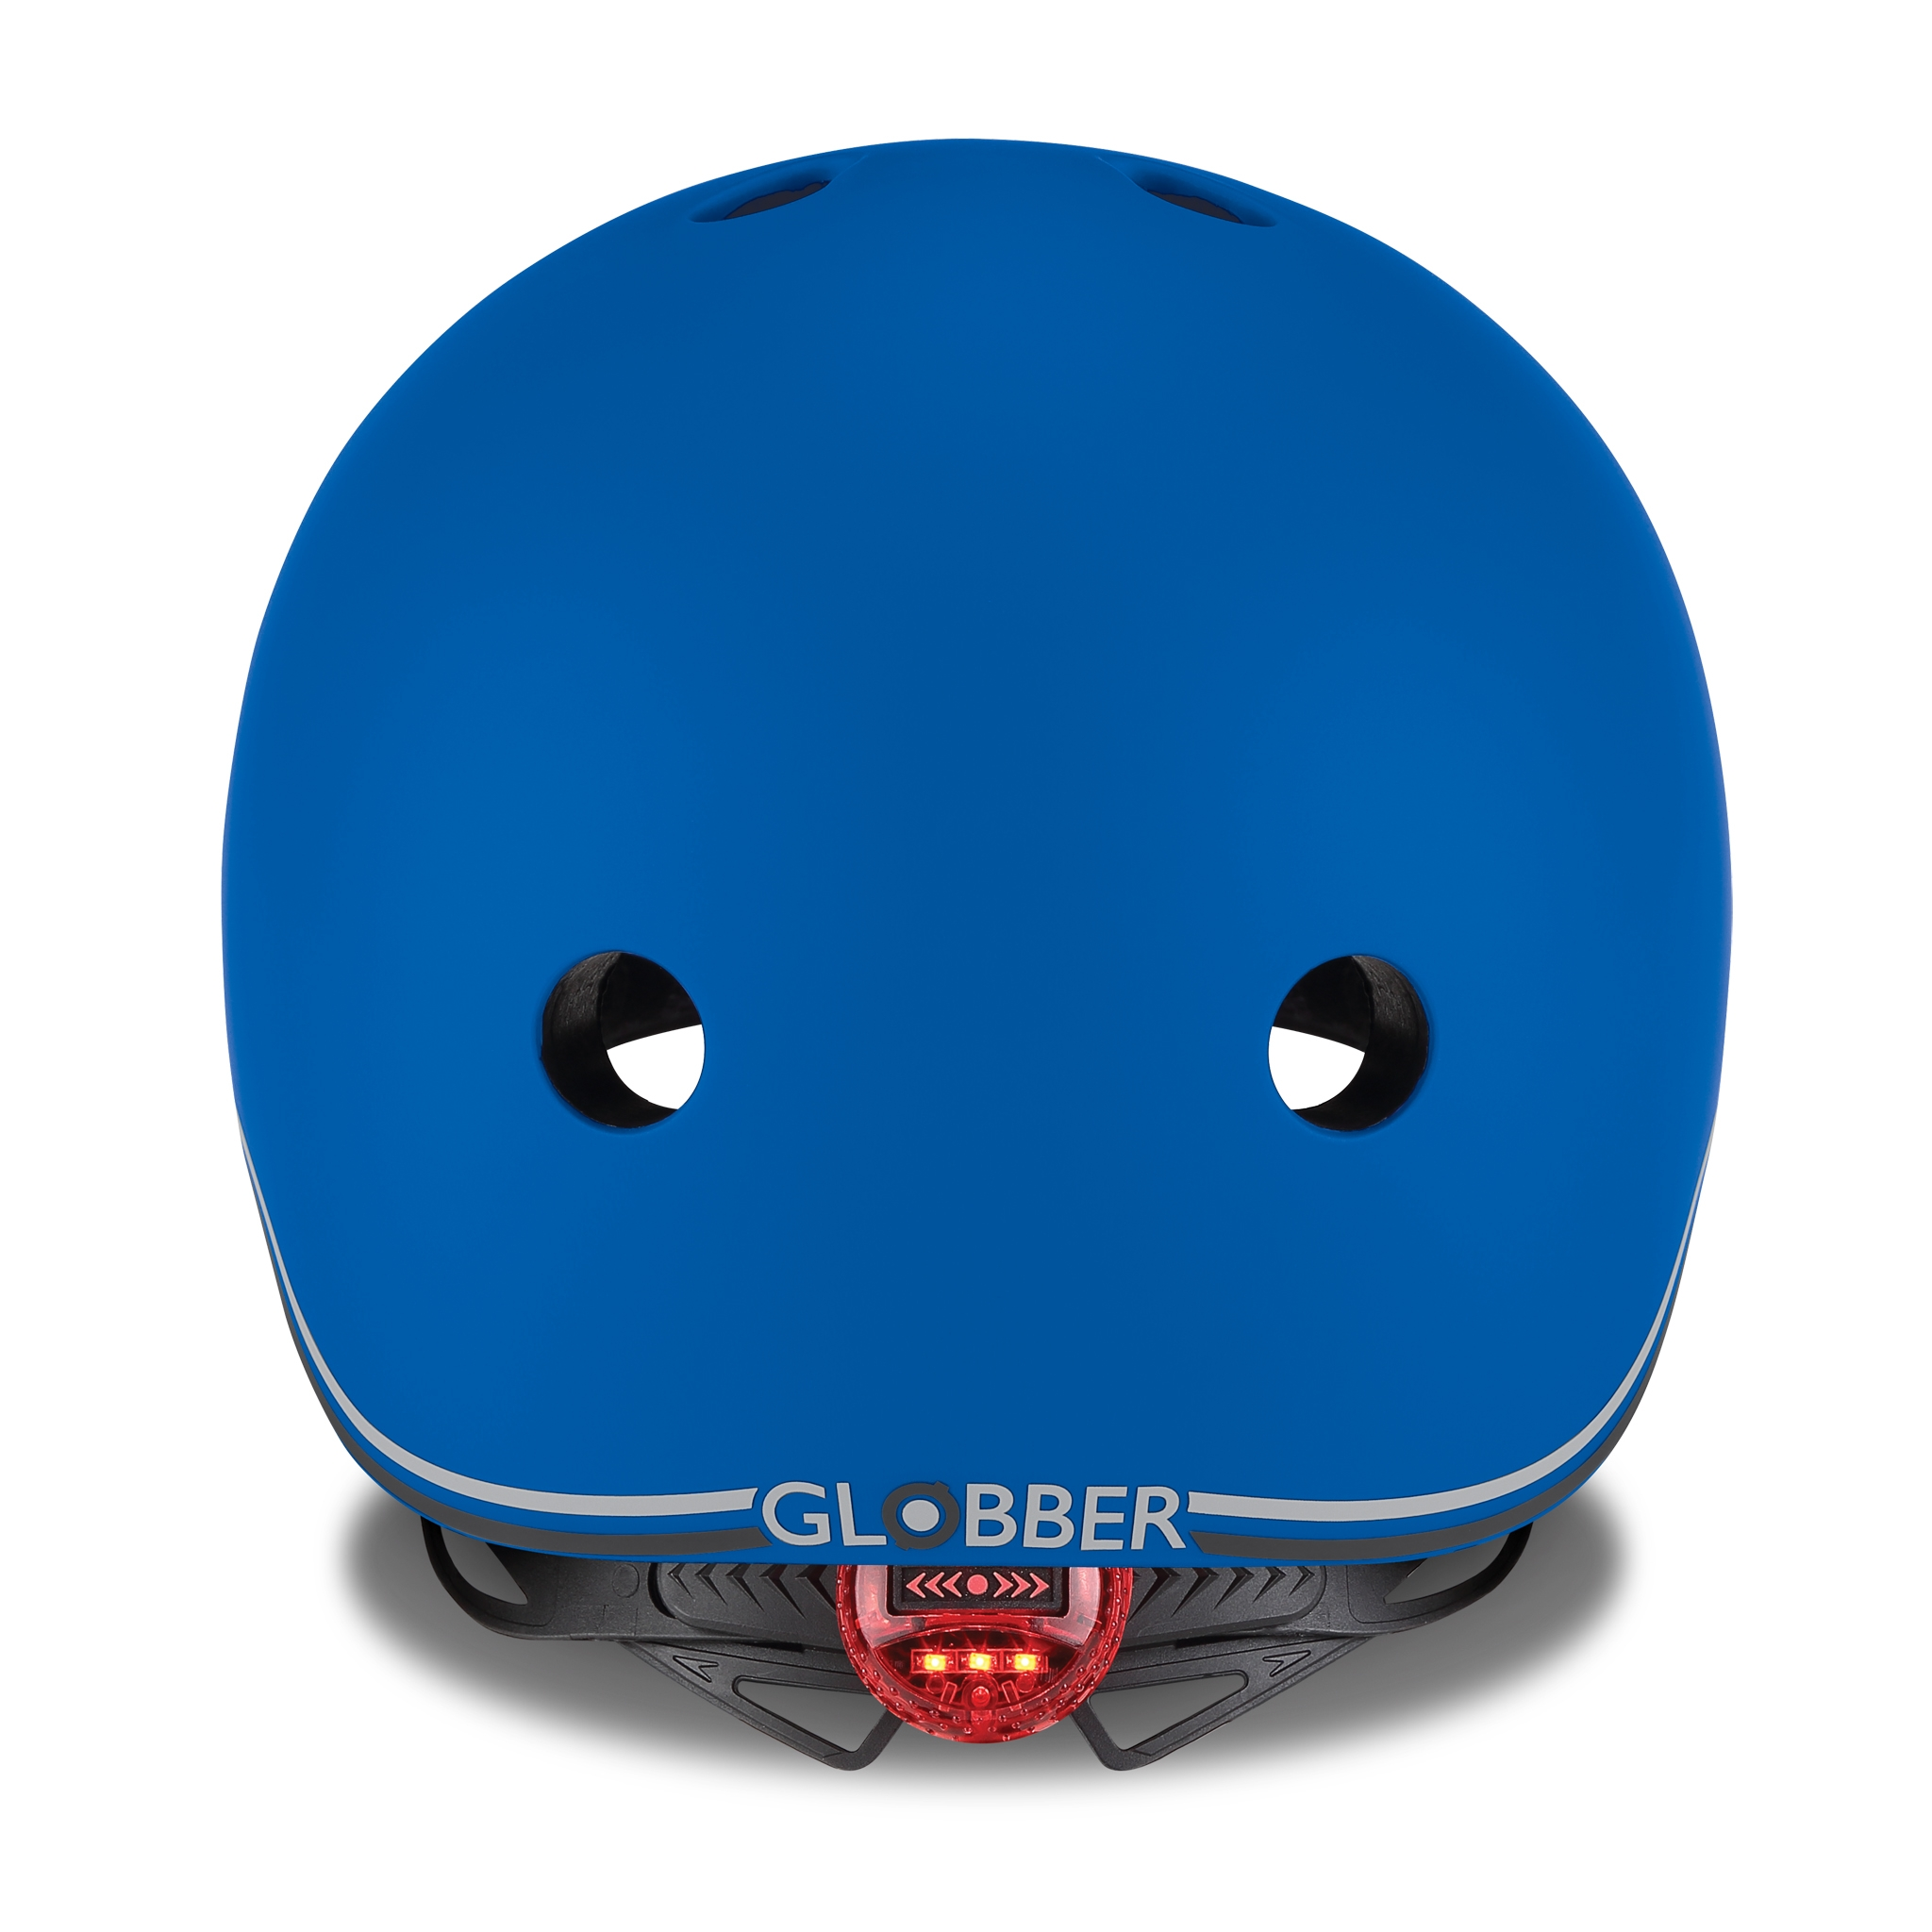 EVO-helmets-scooter-helmets-for-toddlers-with-LED-lights-safe-helmet-for-toddlers-navy-blue 2